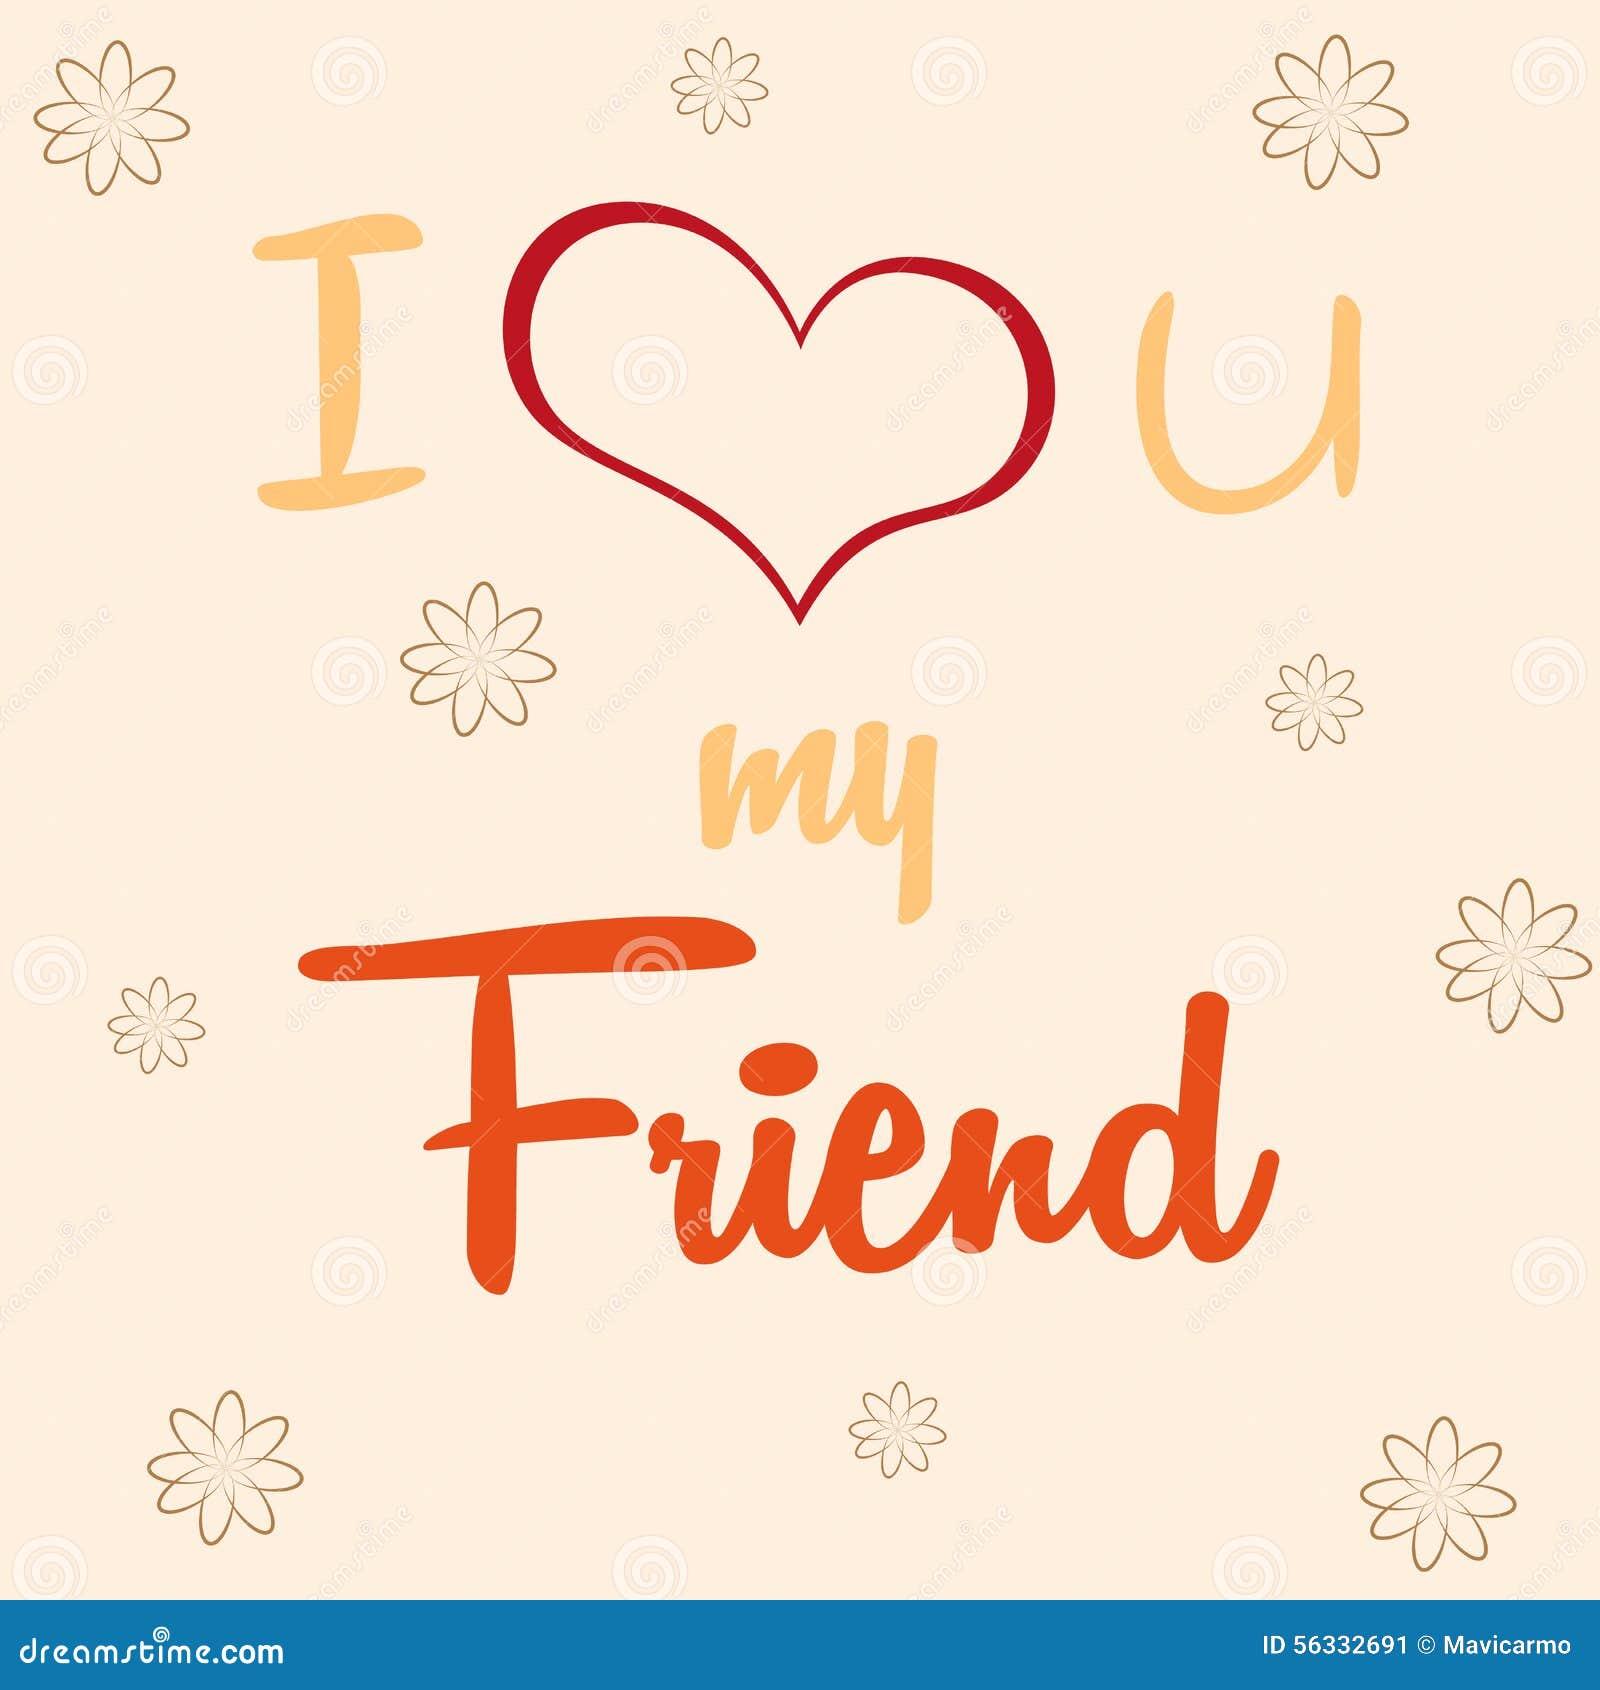 I Love U My Friend Template Design Stock Illustration Illustration